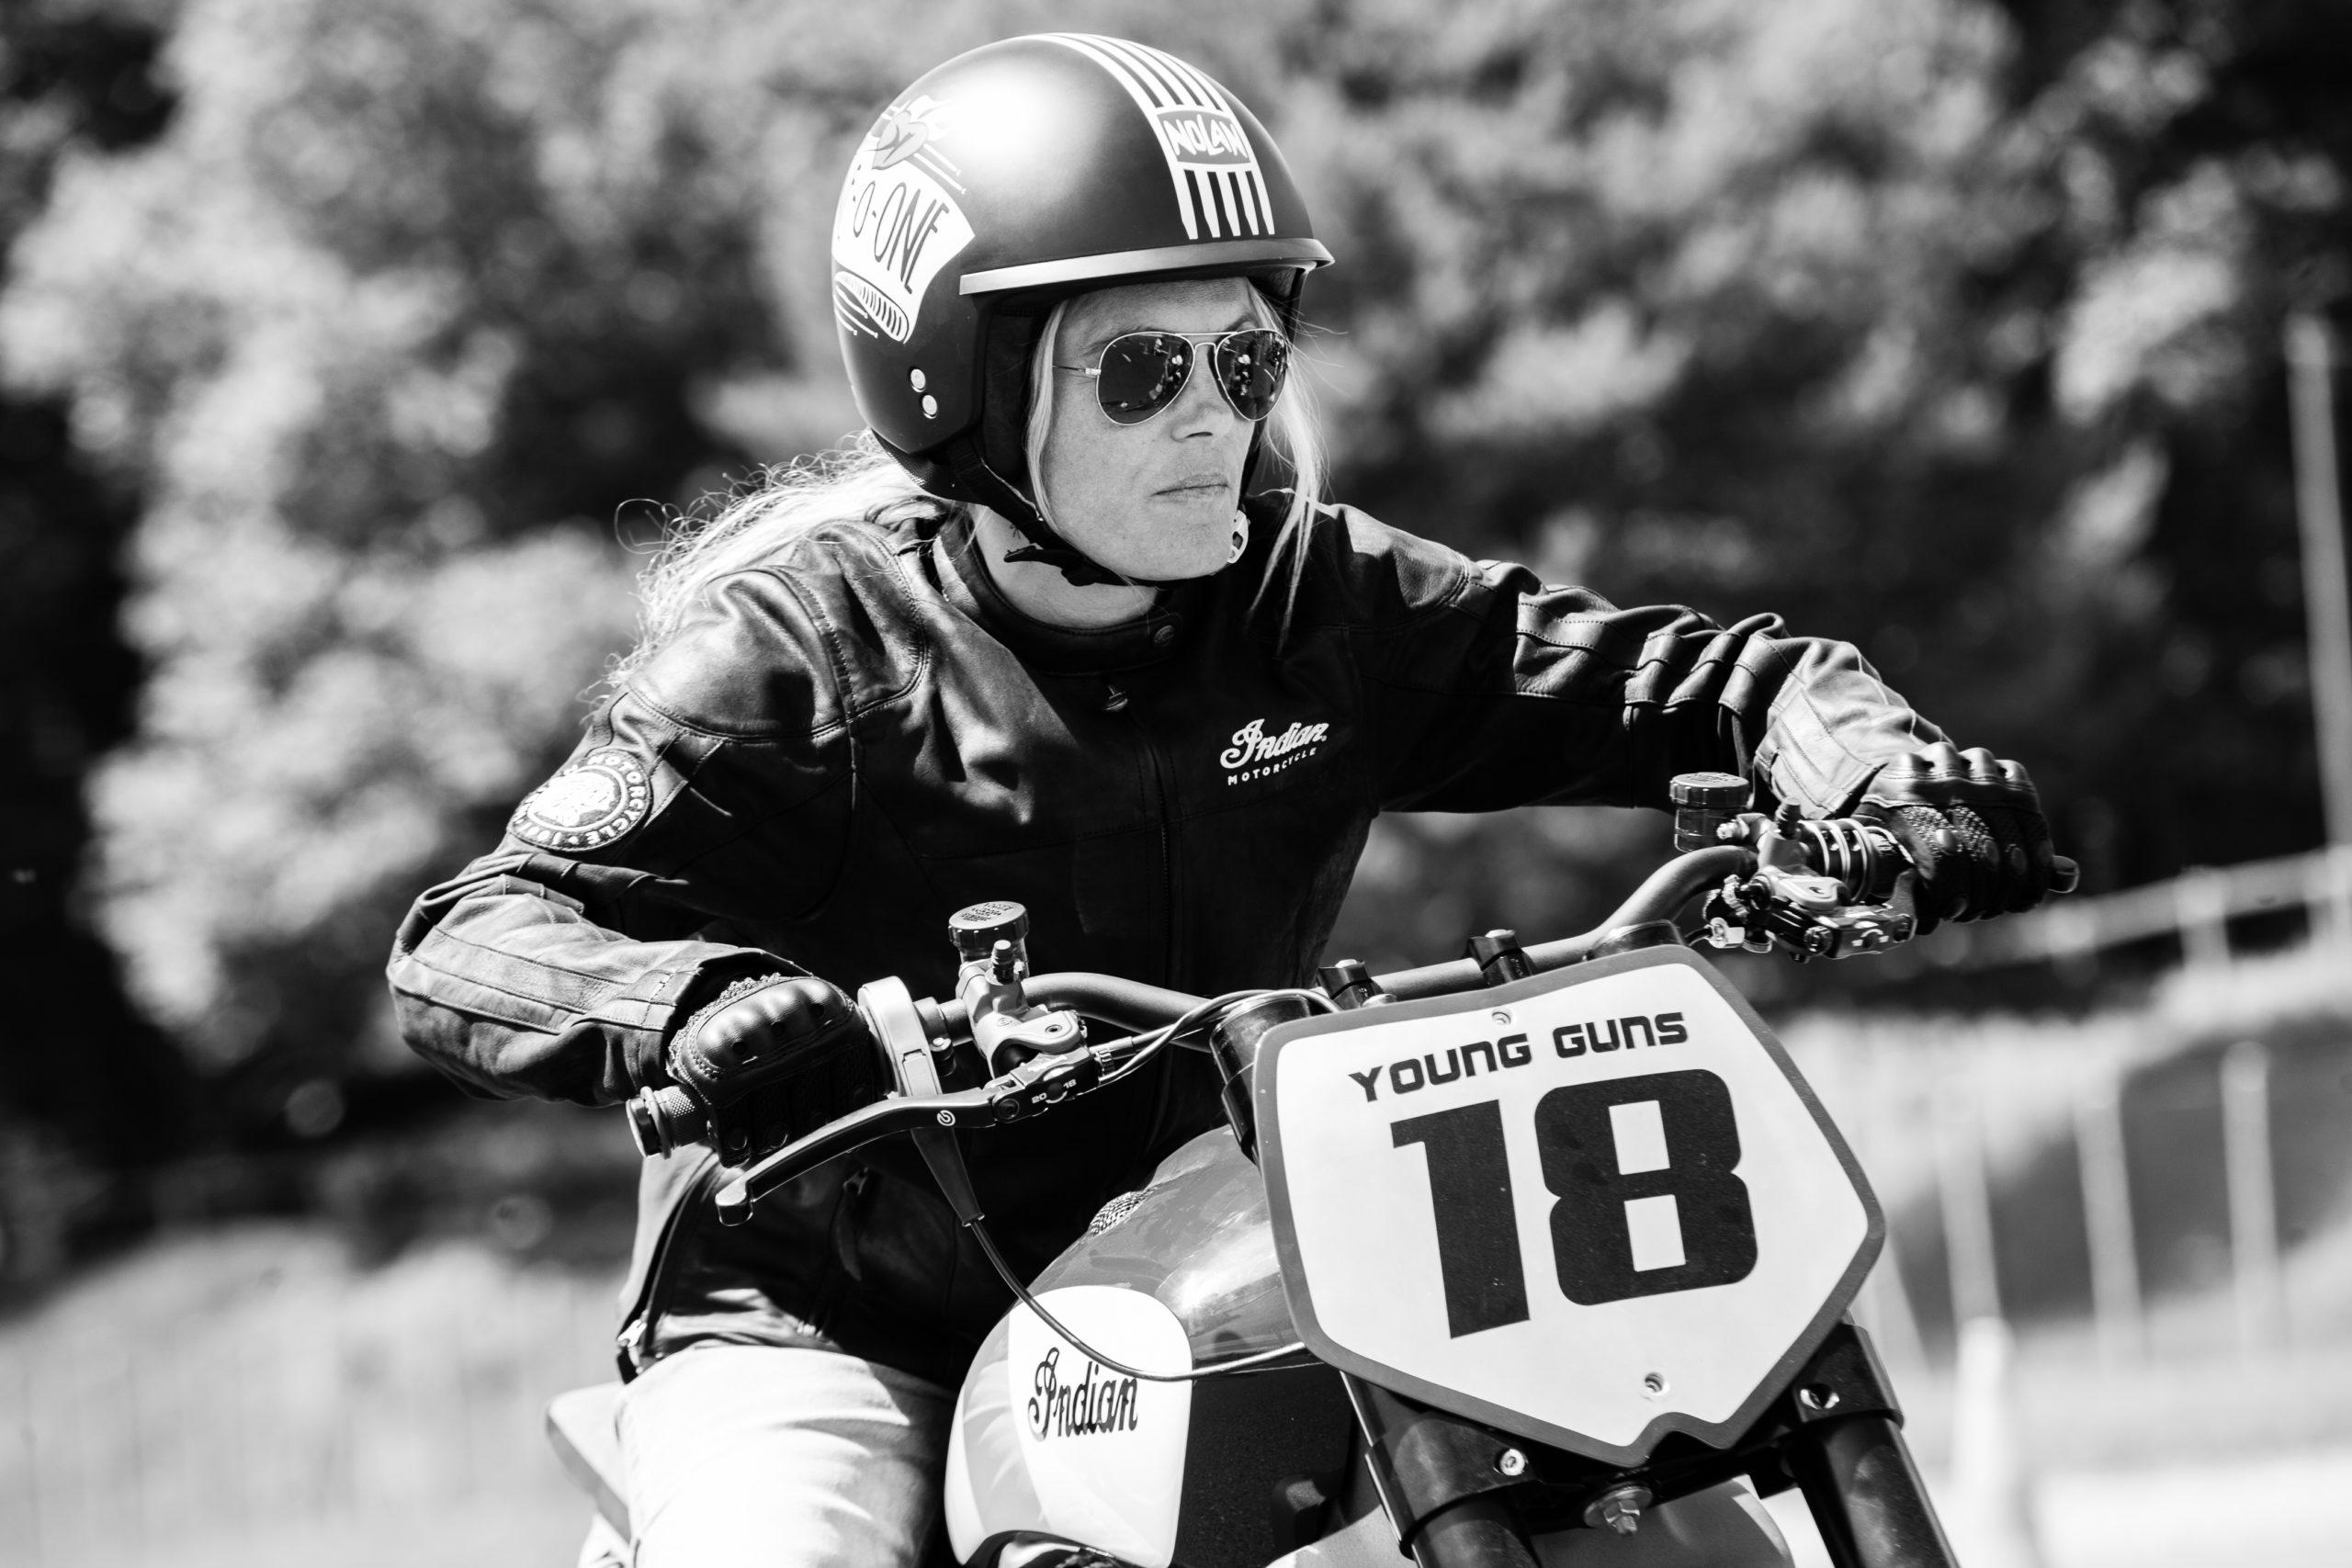 Indian Motorcycle vidéo